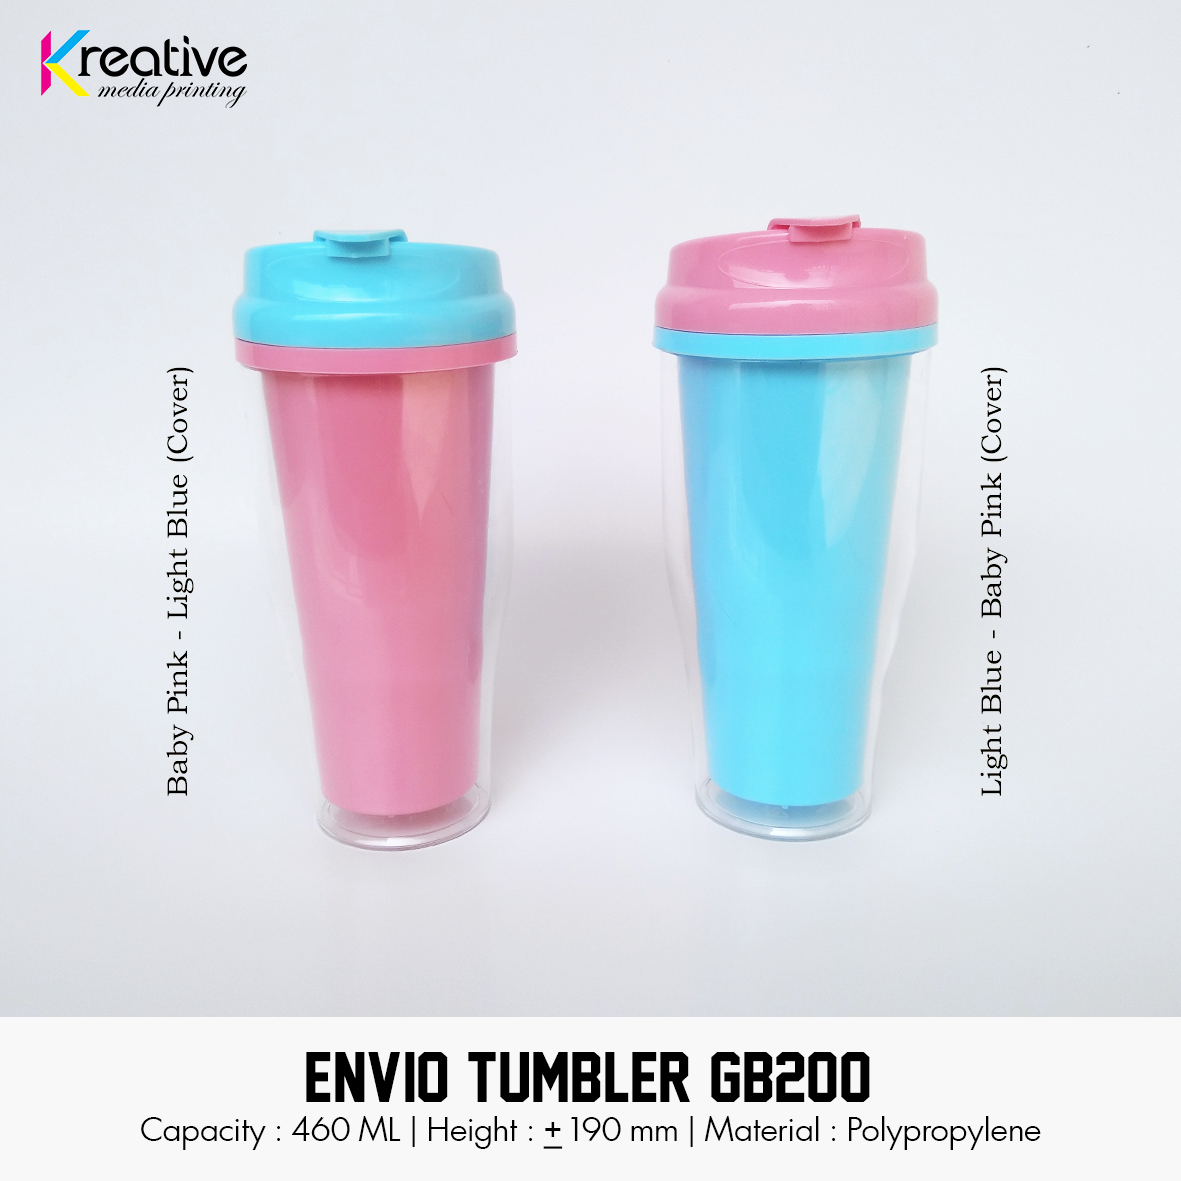 Envio Tumbler GB200 Technoplast (4)